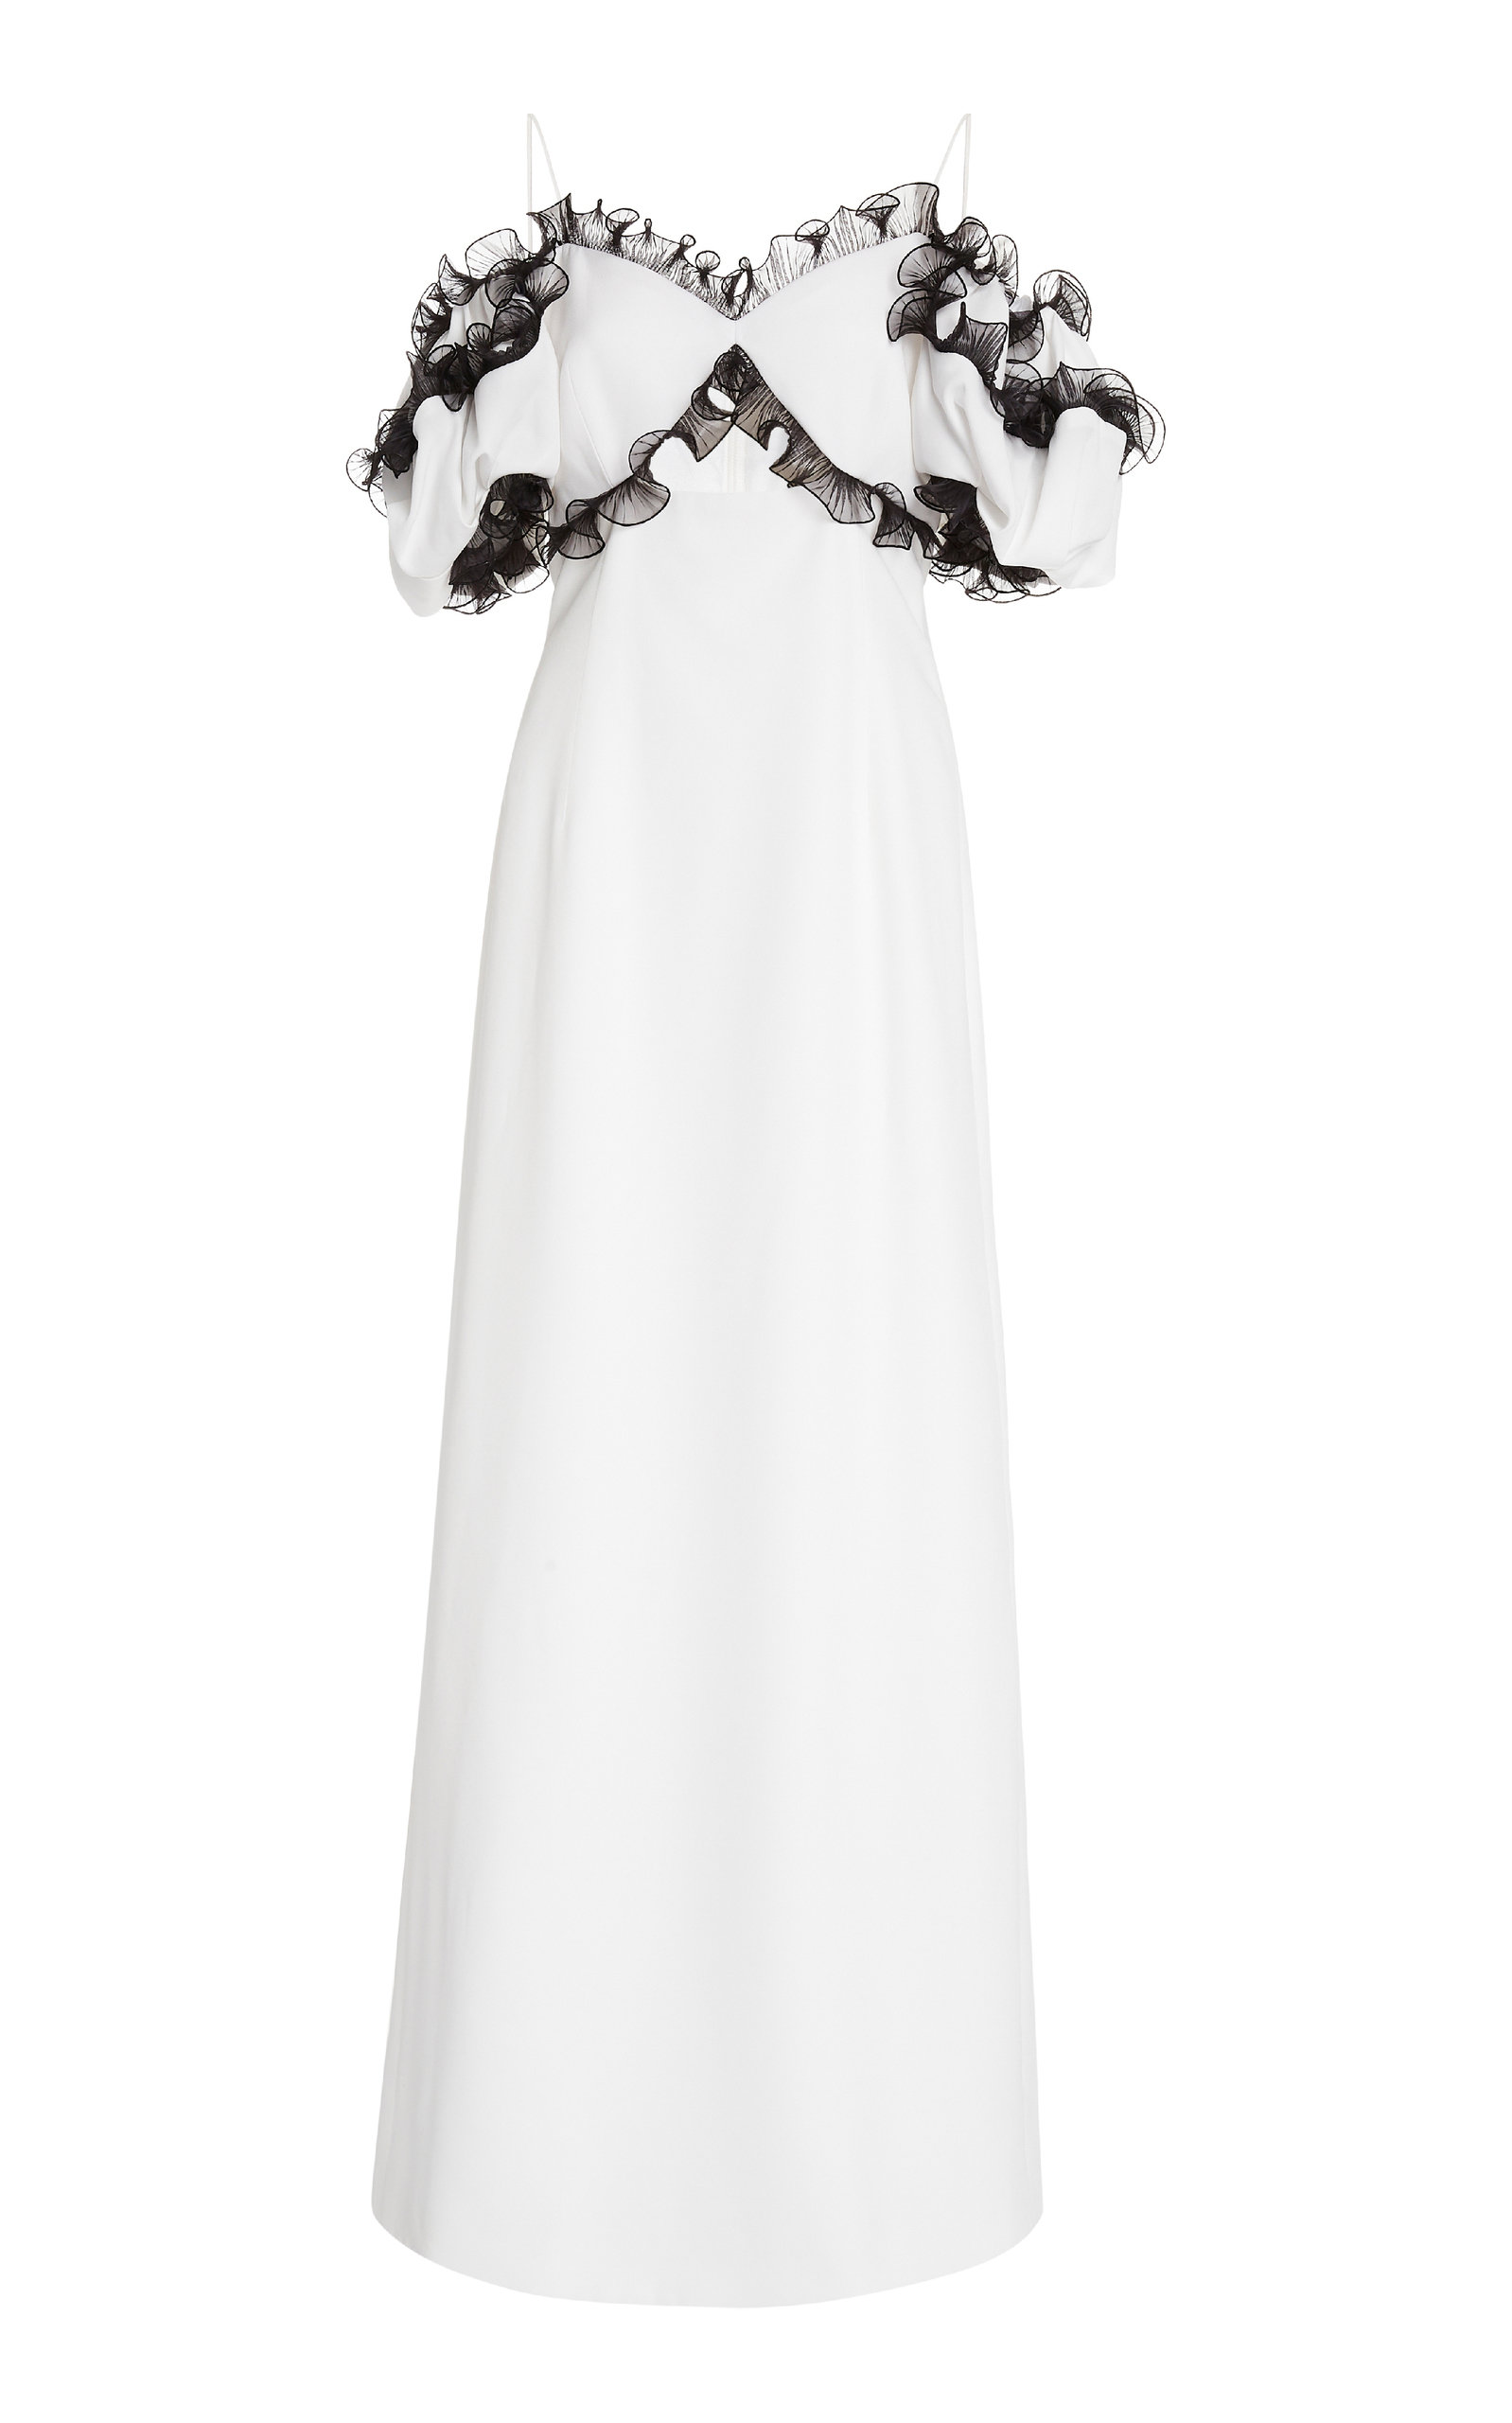 Buy Givenchy Cold-Shoulder Tulle-Trimmed Crepe Dress online, shop Givenchy at the best price